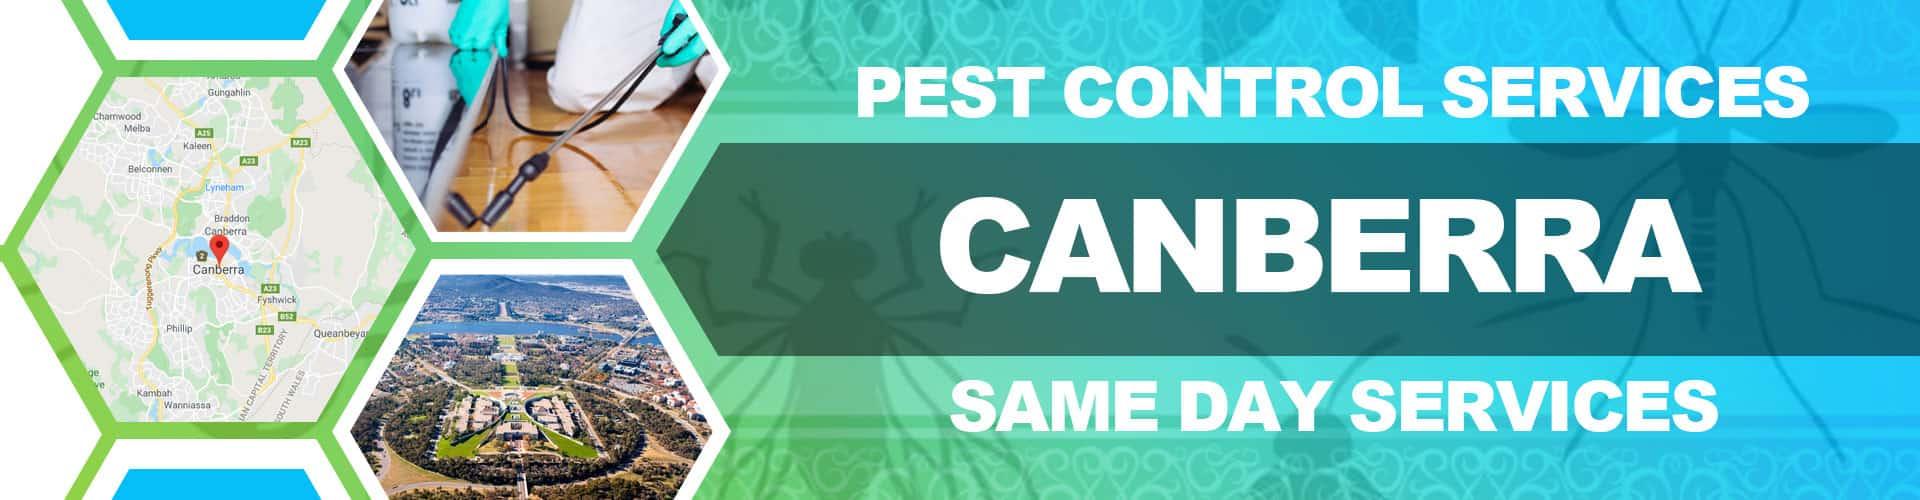 Pest Control Services Canberra